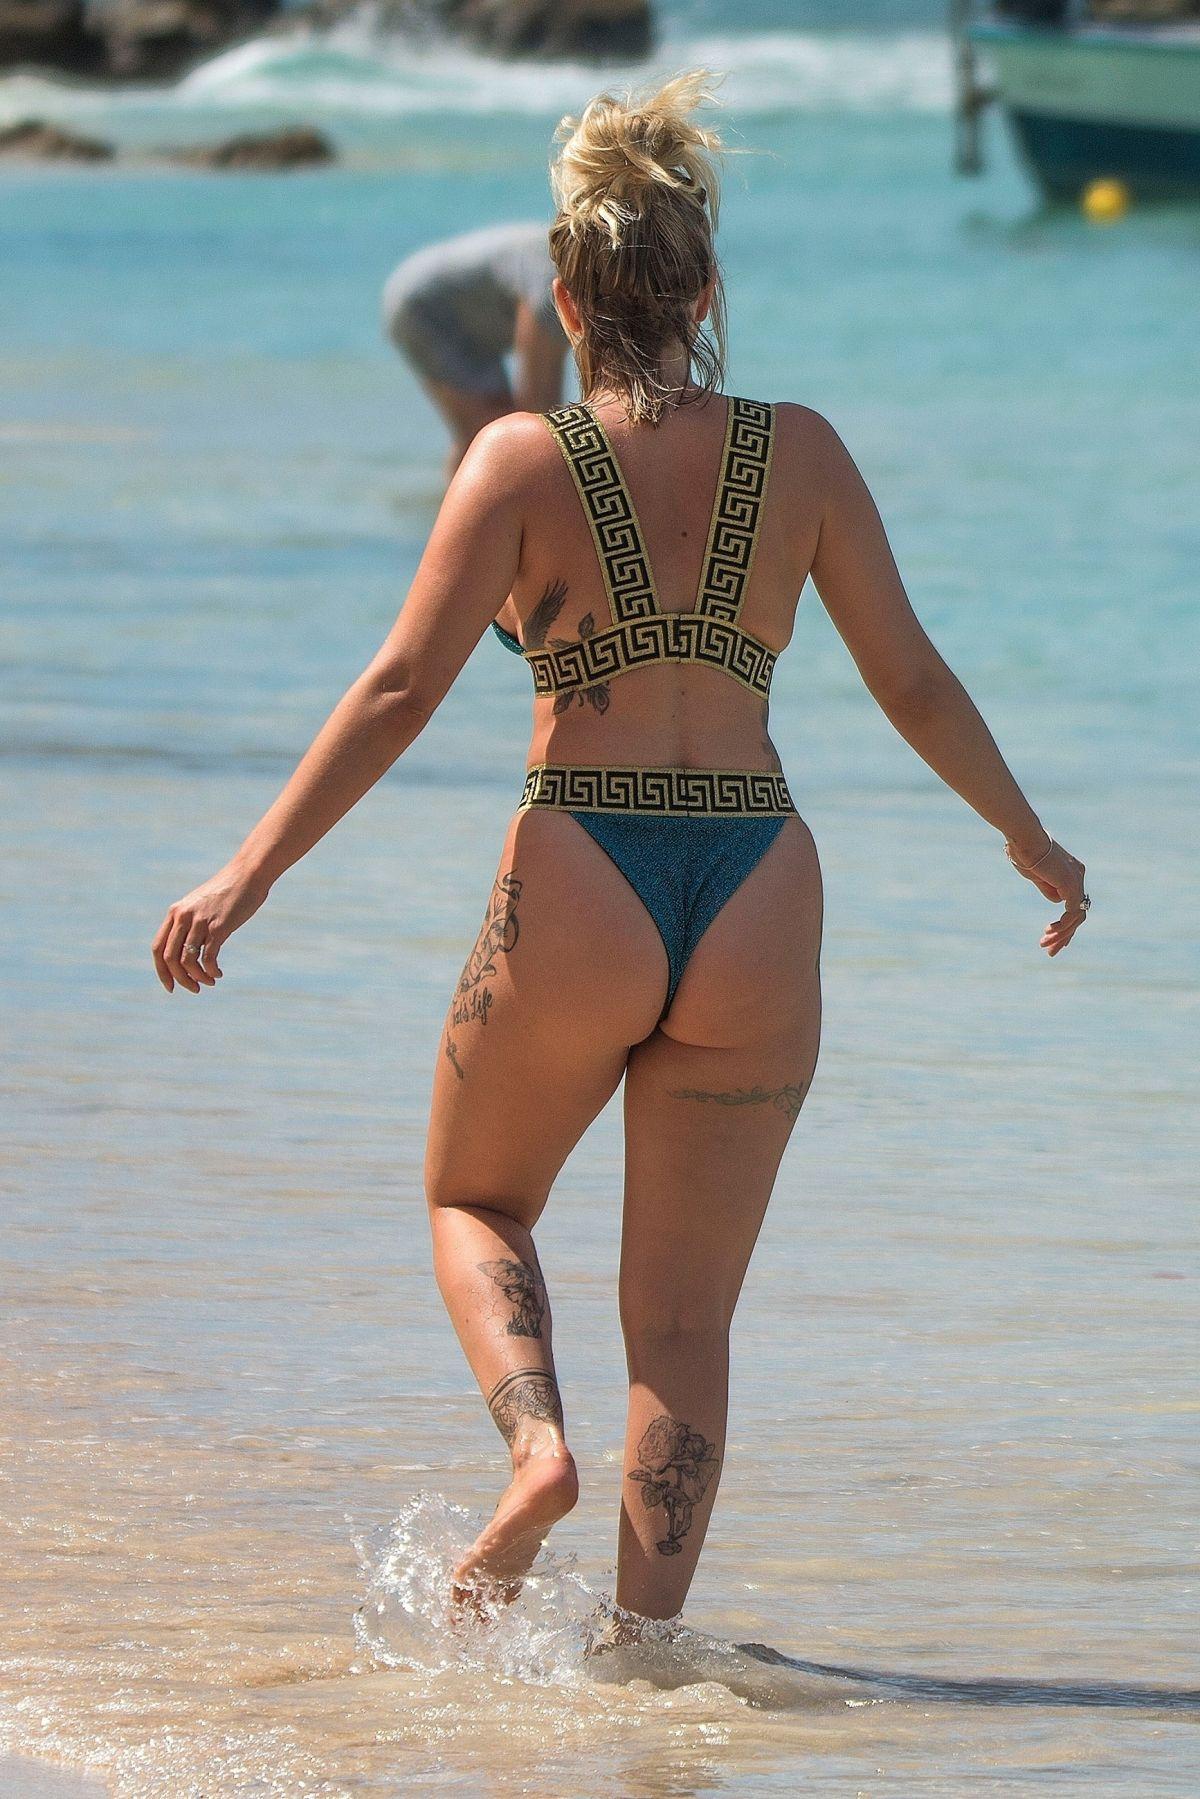 Bikini Olivia Buckland Bowen nude (82 photo), Ass, Cleavage, Selfie, swimsuit 2015